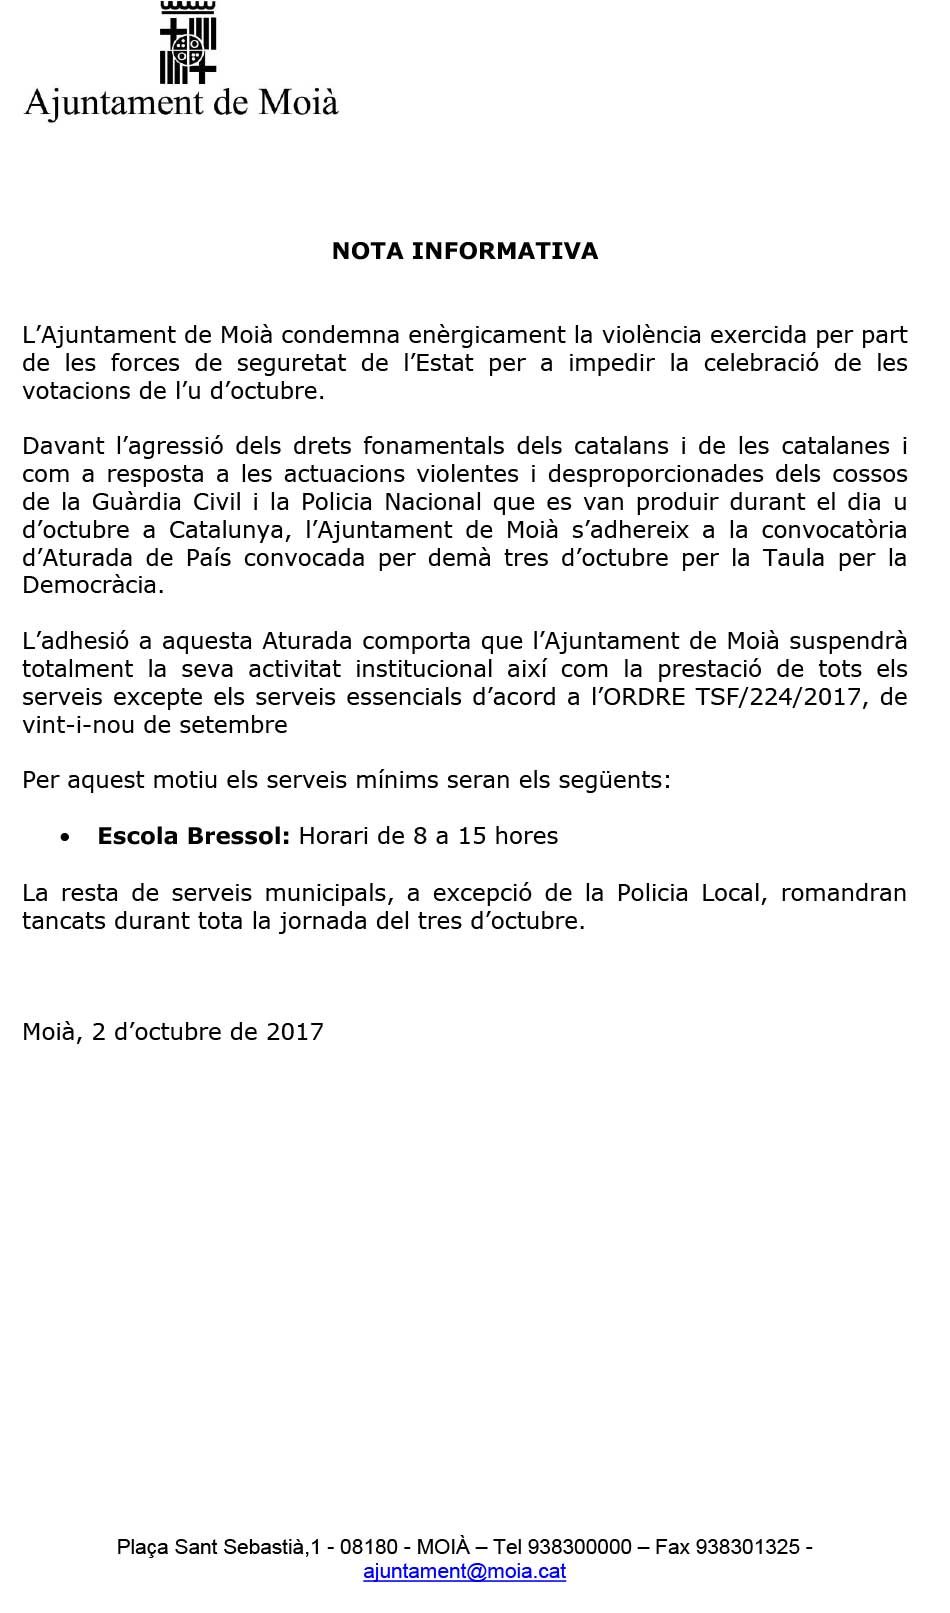 NOTA-INFORMATIVA-PARADA-GENERAL-3-OCT-2017